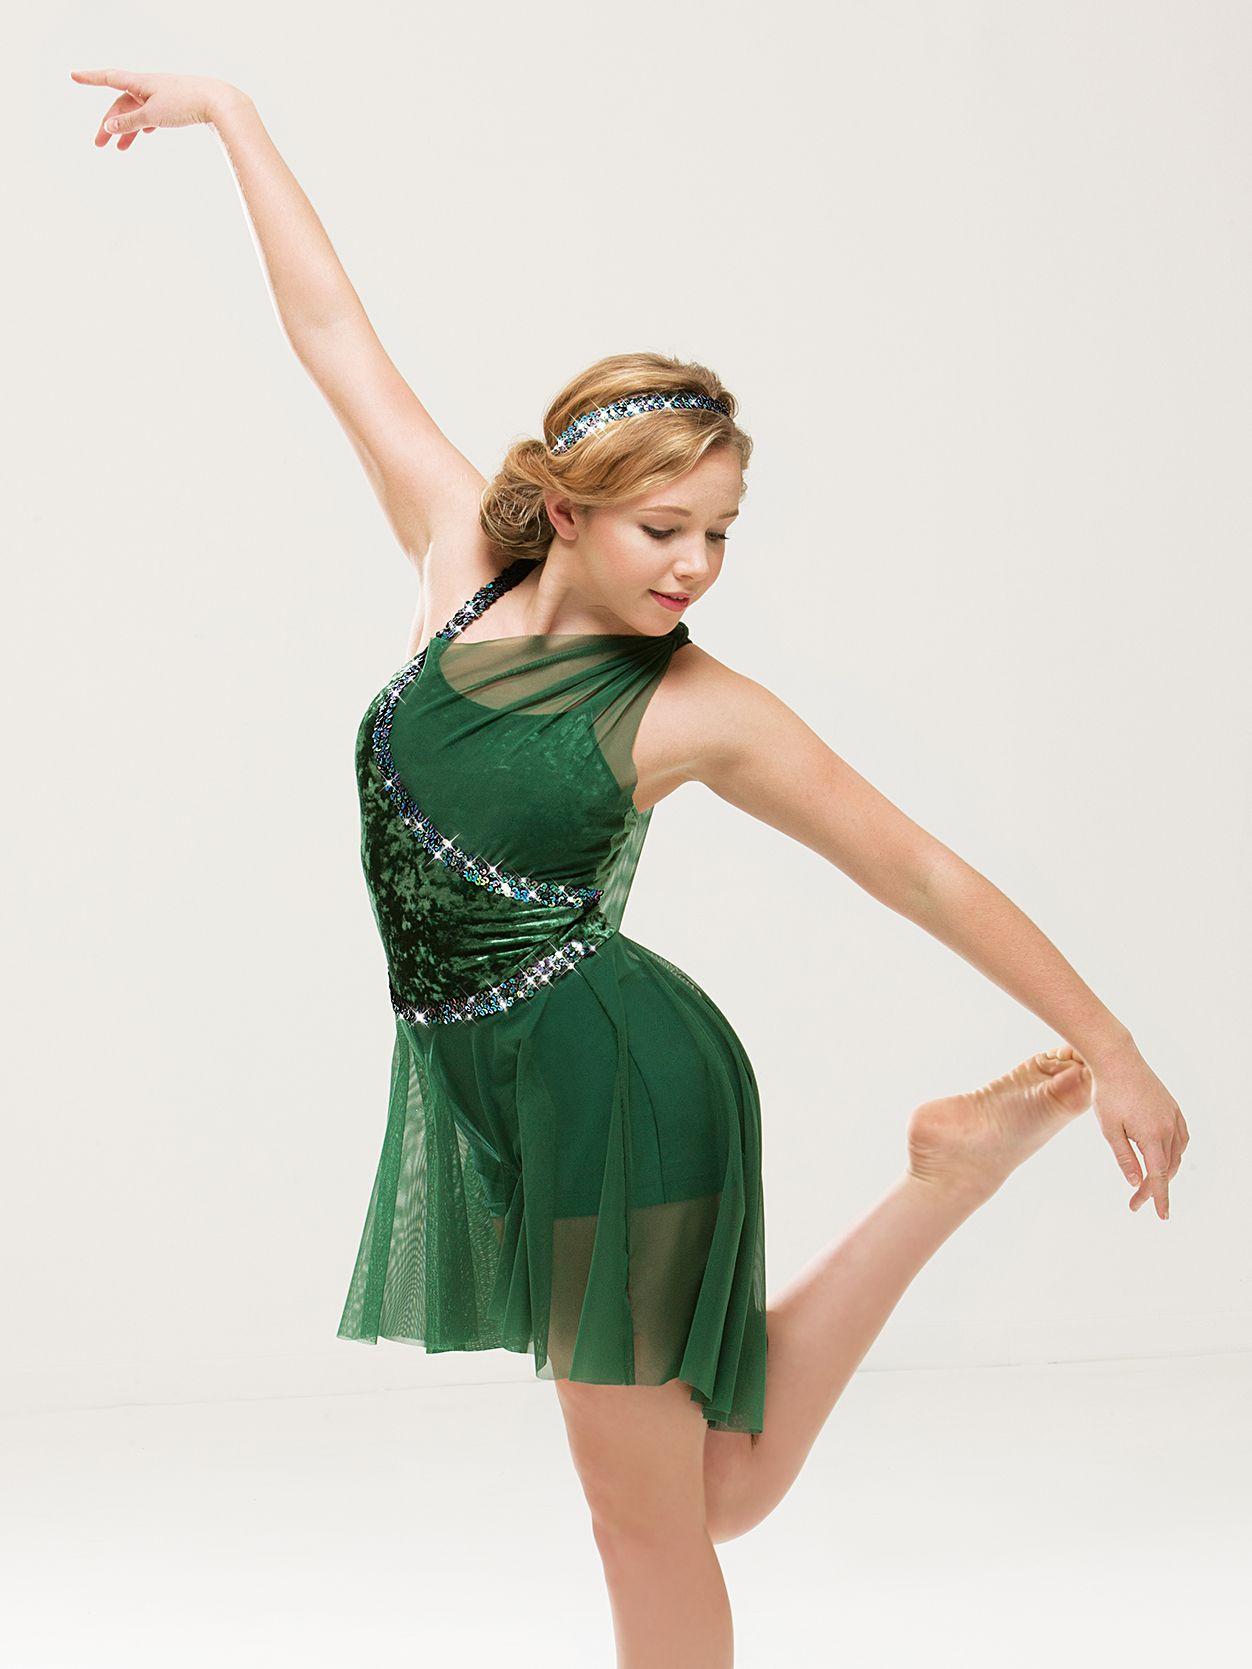 Evergreen dance dresses dance outfits modern dance costume